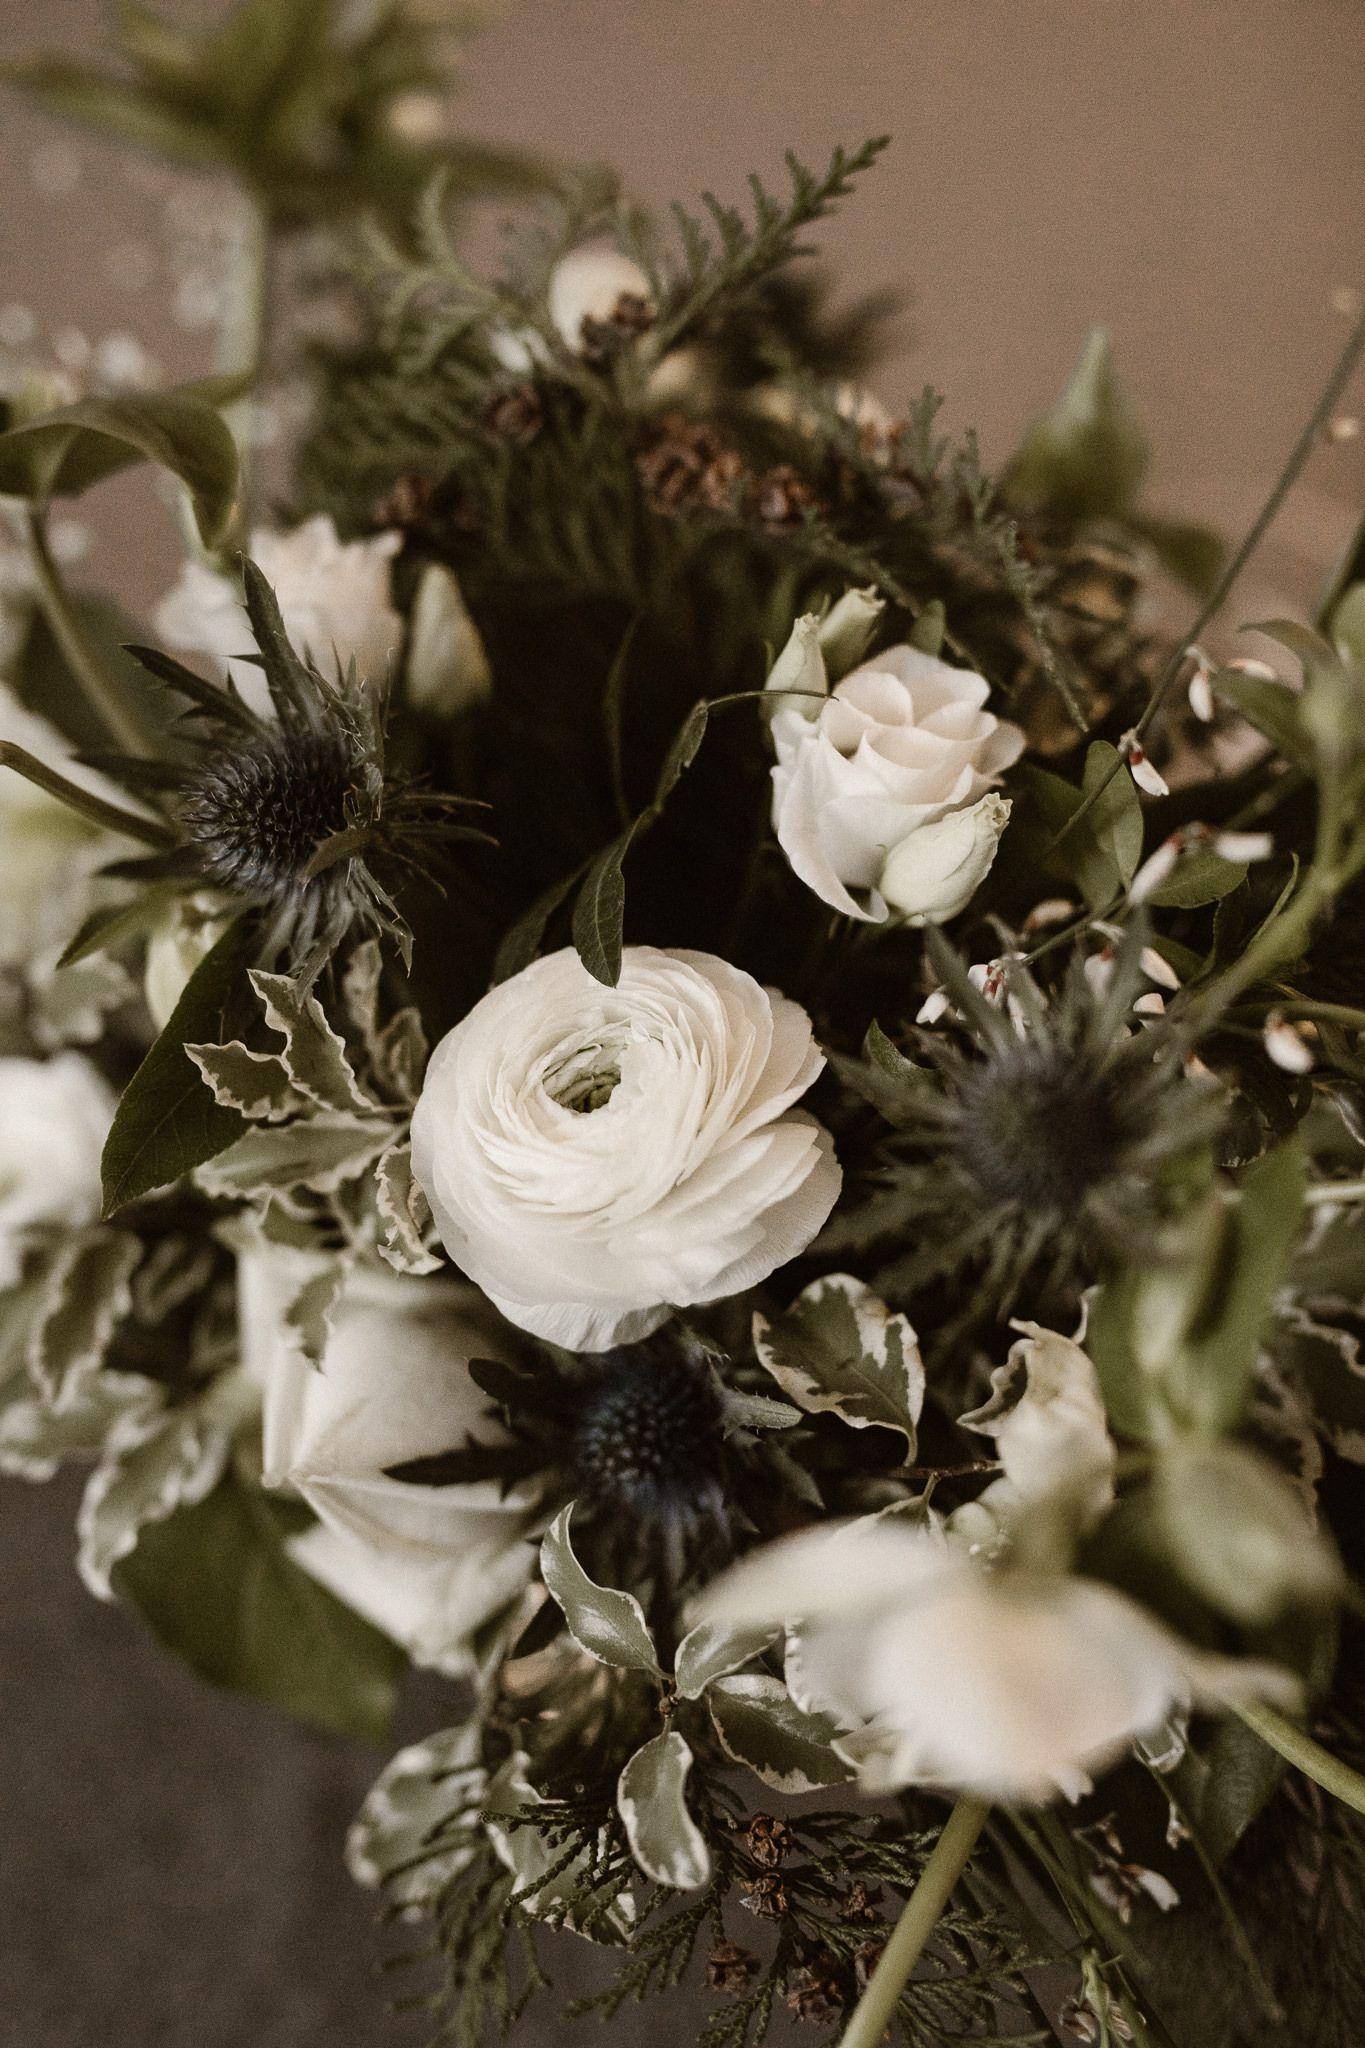 Inna Studio Winter Wedding Flowers For The Winter Wedding White Gold Green White And Wedding Bouquet Winter Wedding Bouquet Winter White Green Bou Plants Studio